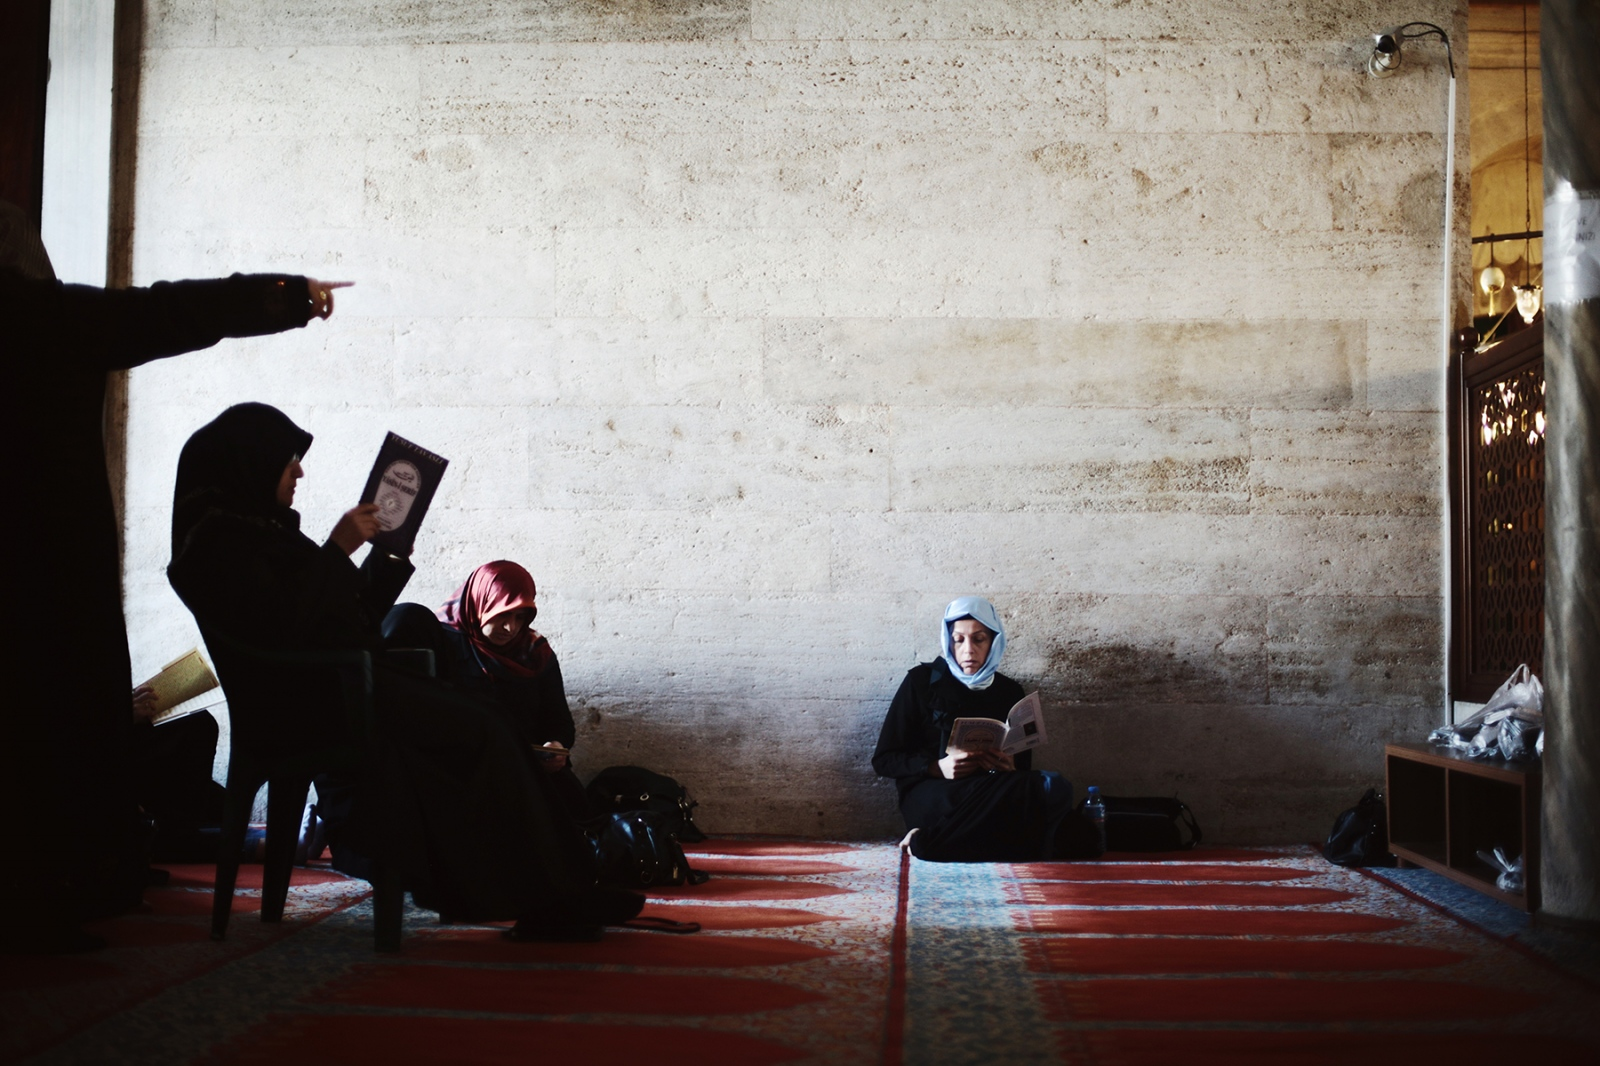 Photography image - Female section of the Suleymaniye Mosque. Istanbul, 2013